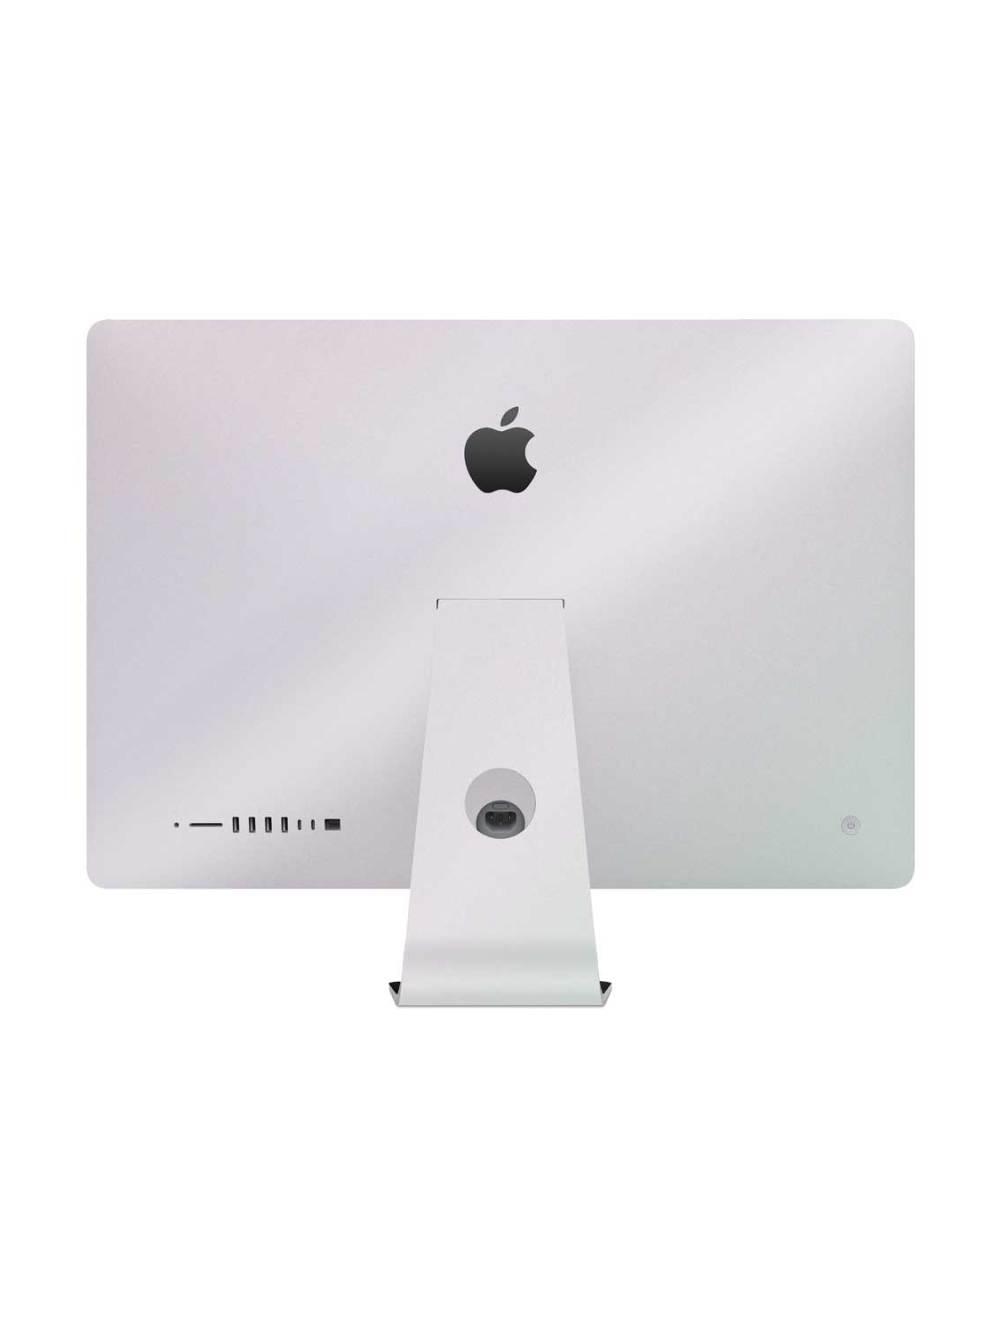 Matt Aurora Pearlescent Metallic Skin for Apple iMac 27-inch